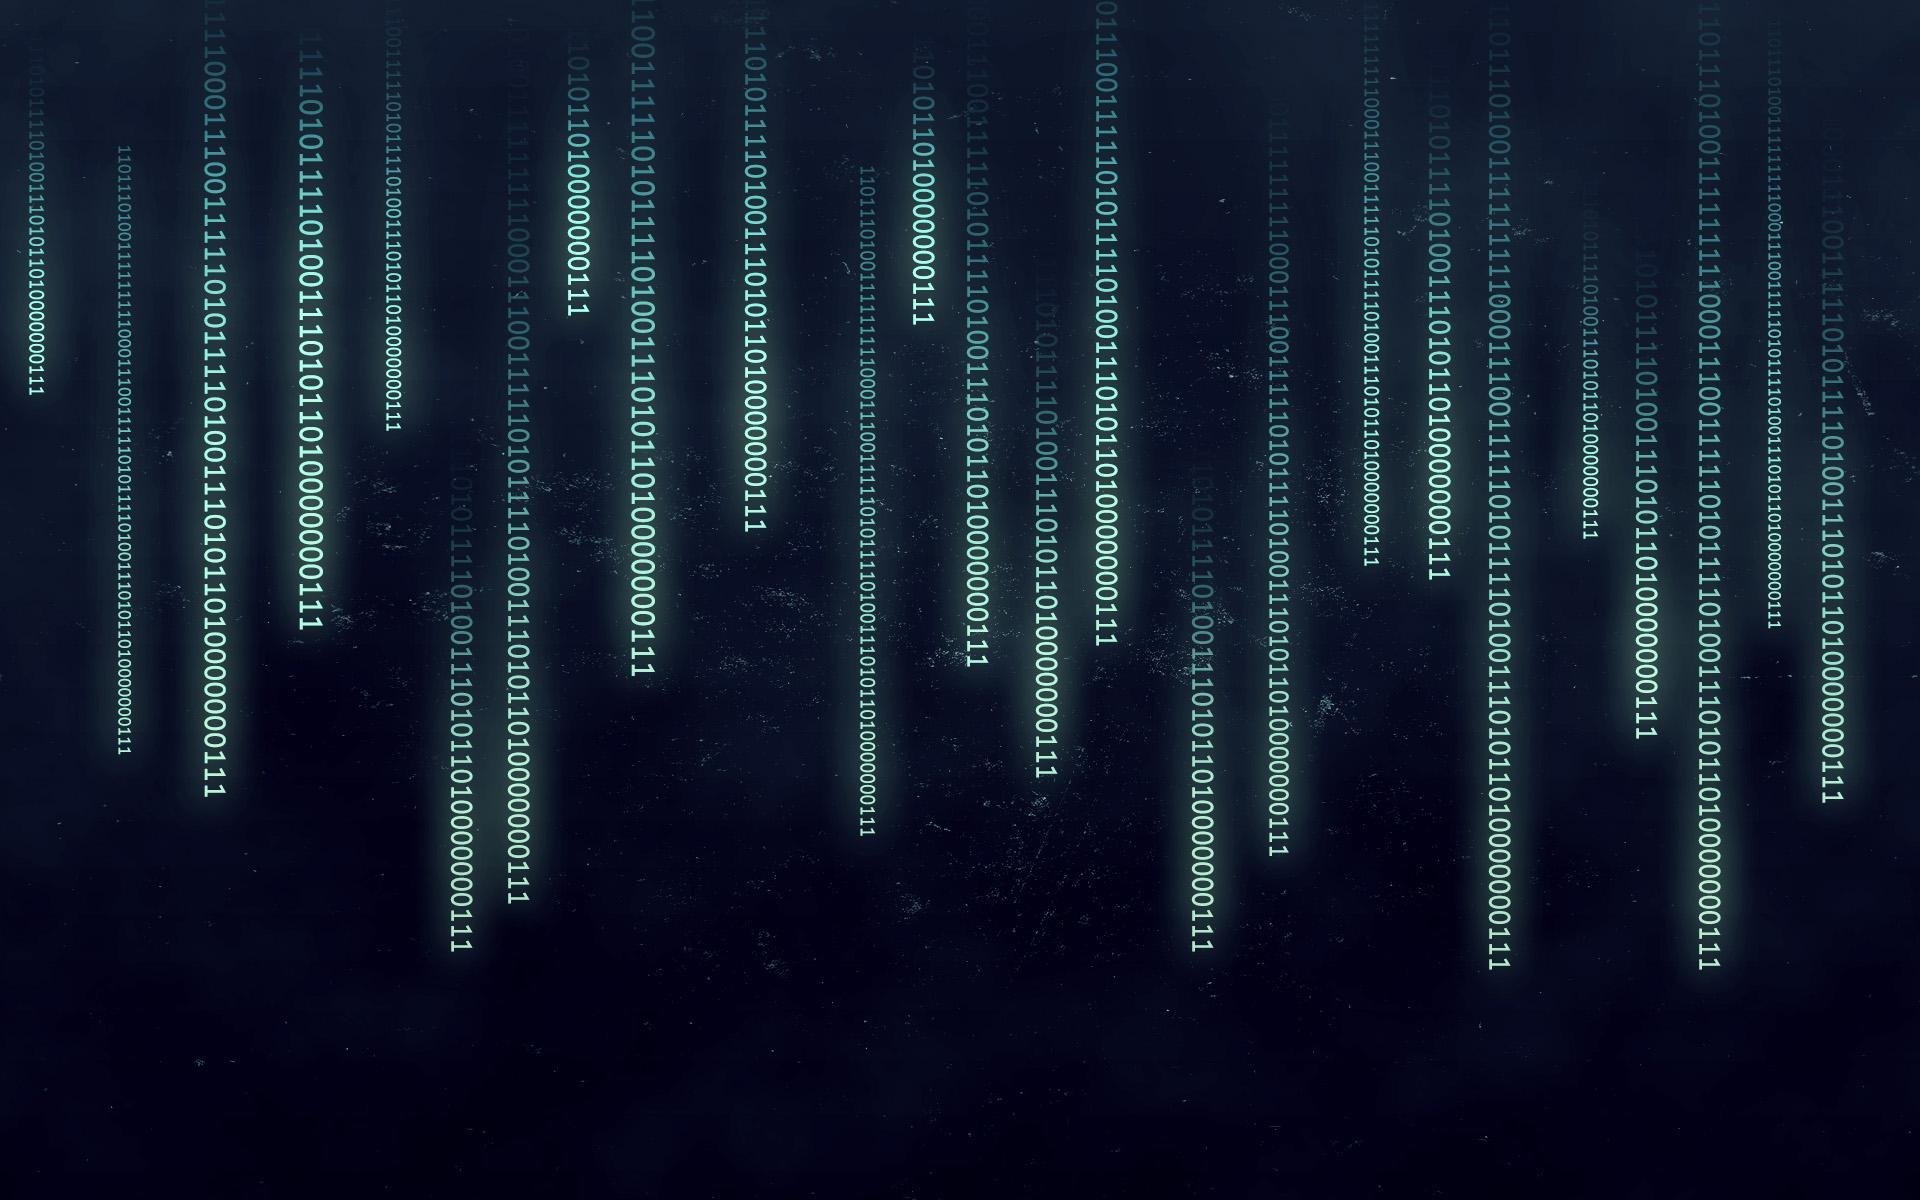 Binary Code Wallpapers 1920x1200